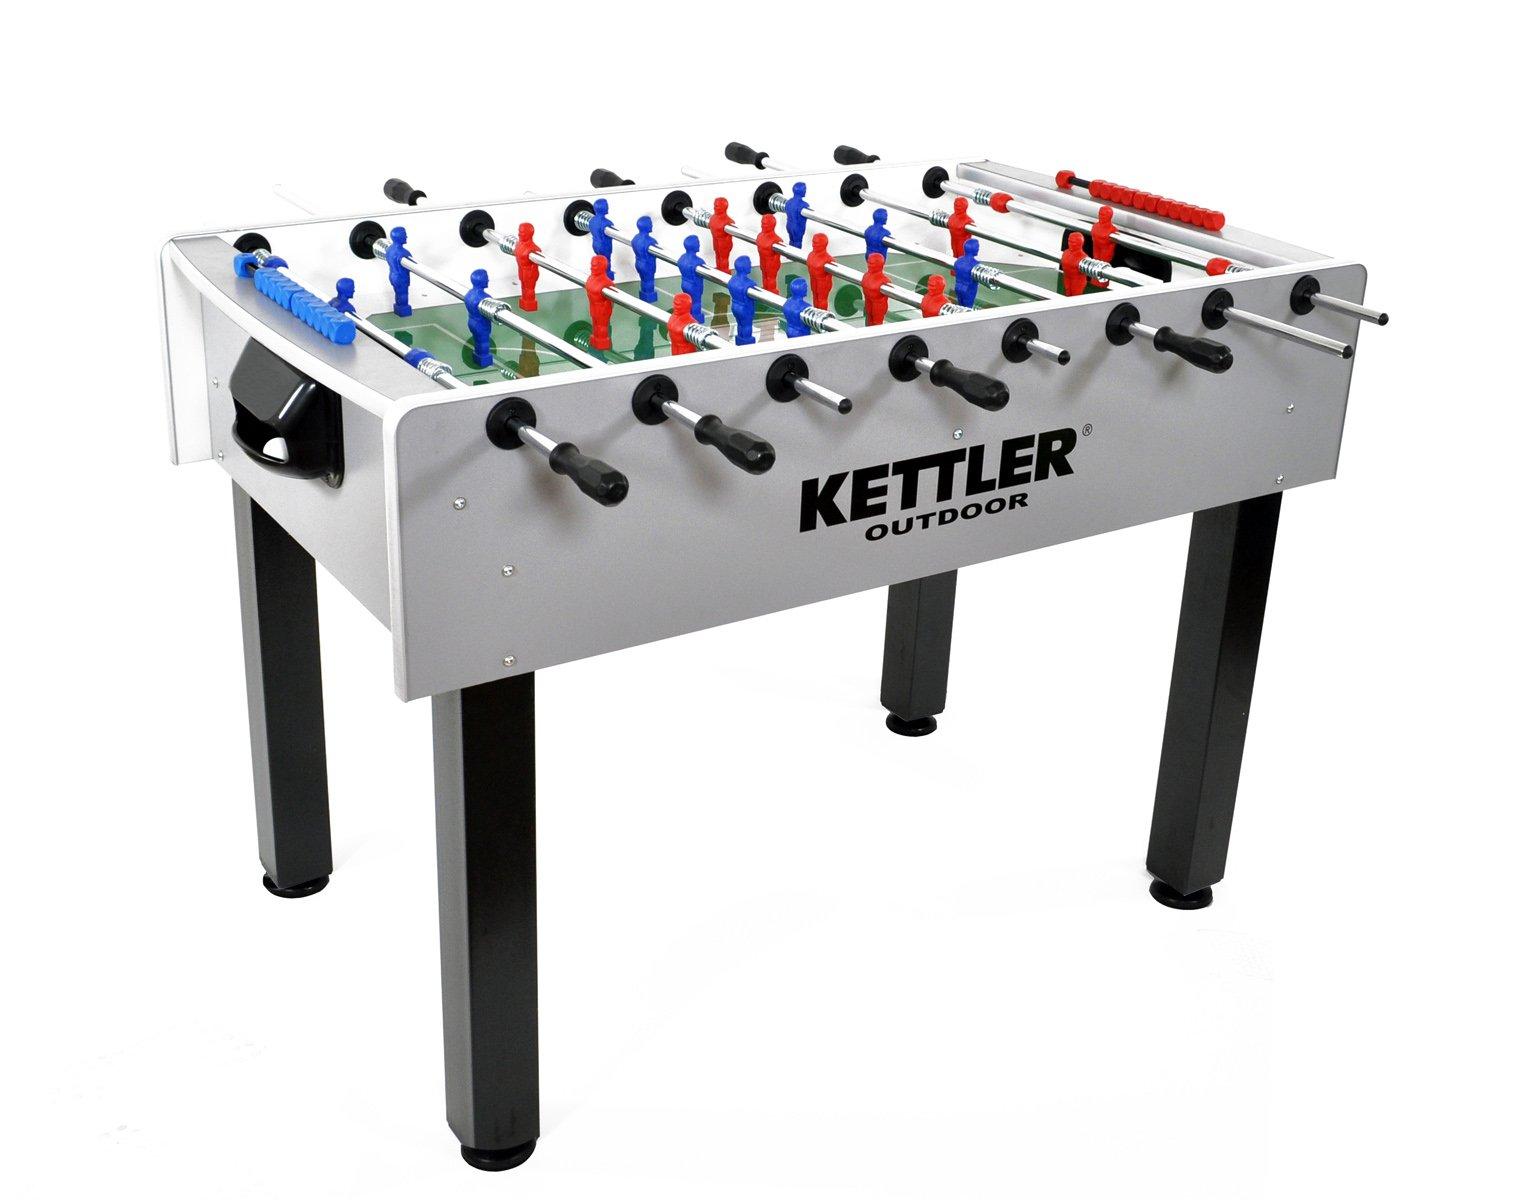 Kettler Carbon Outdoor Foosball Table by Kettler